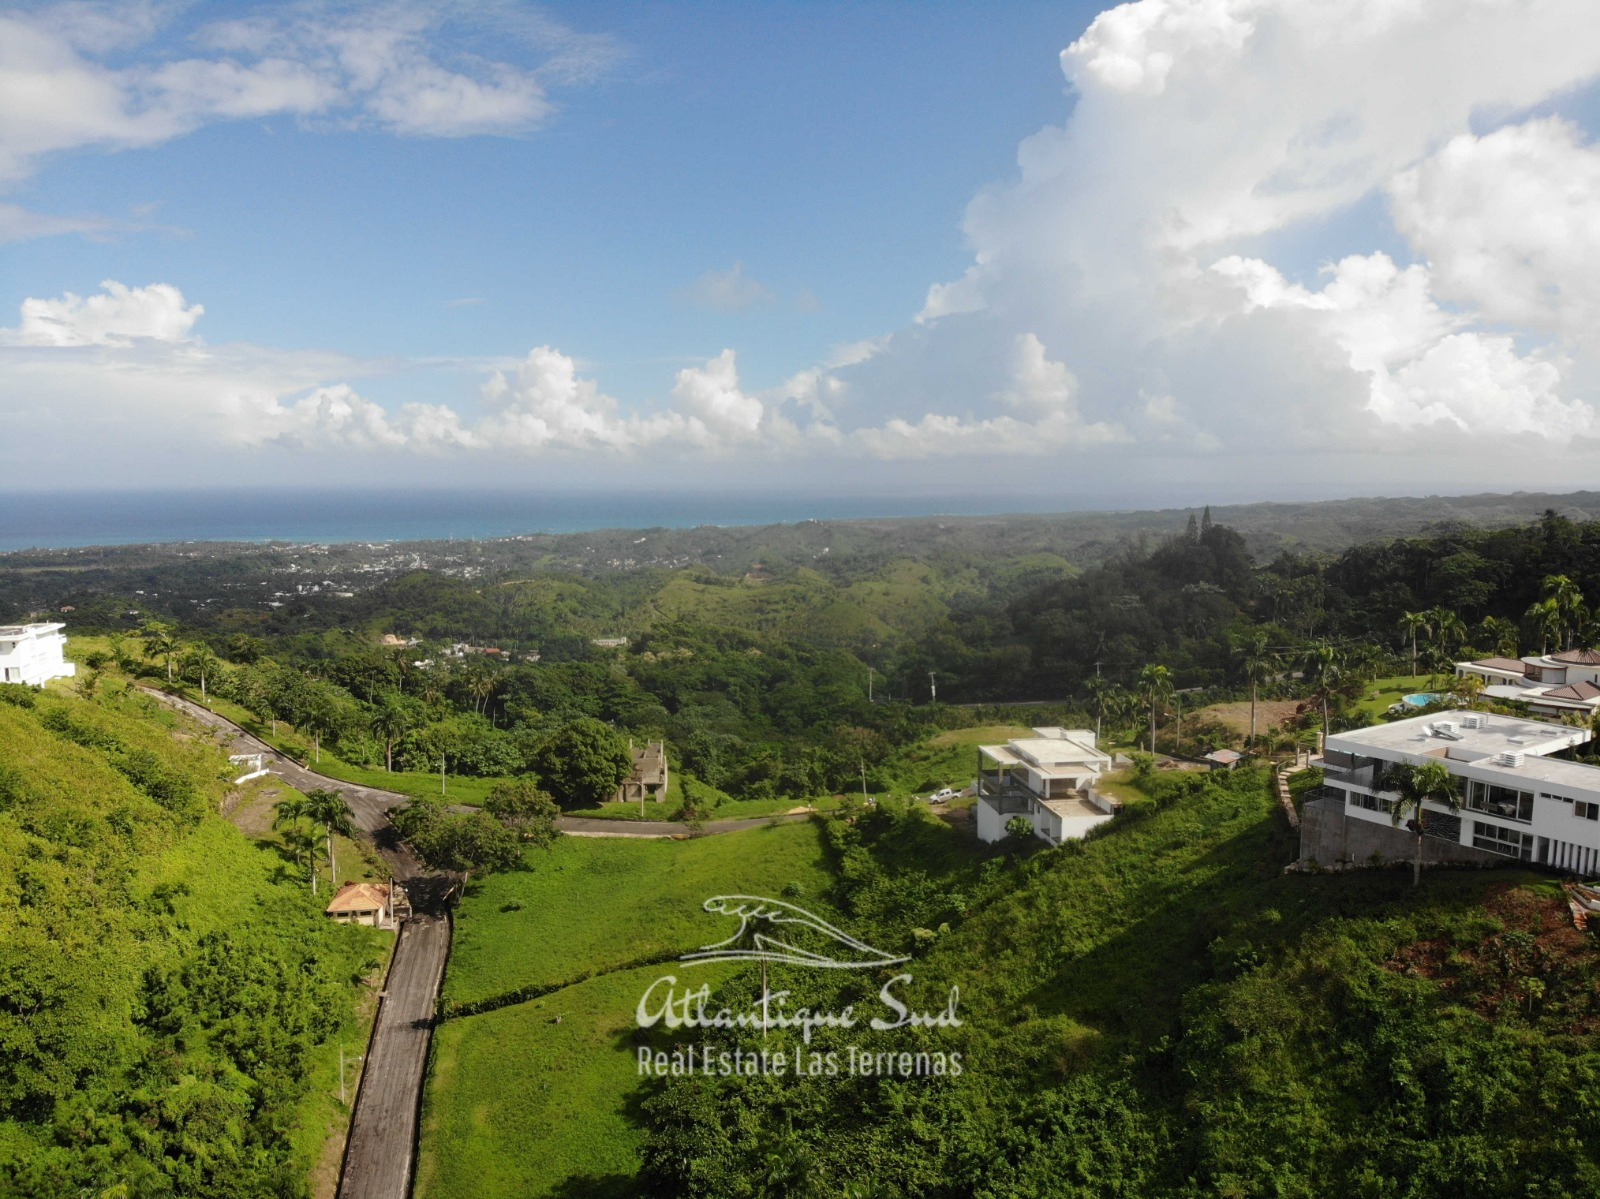 Hillside Lots for sale in Las Terrenas14.jpeg